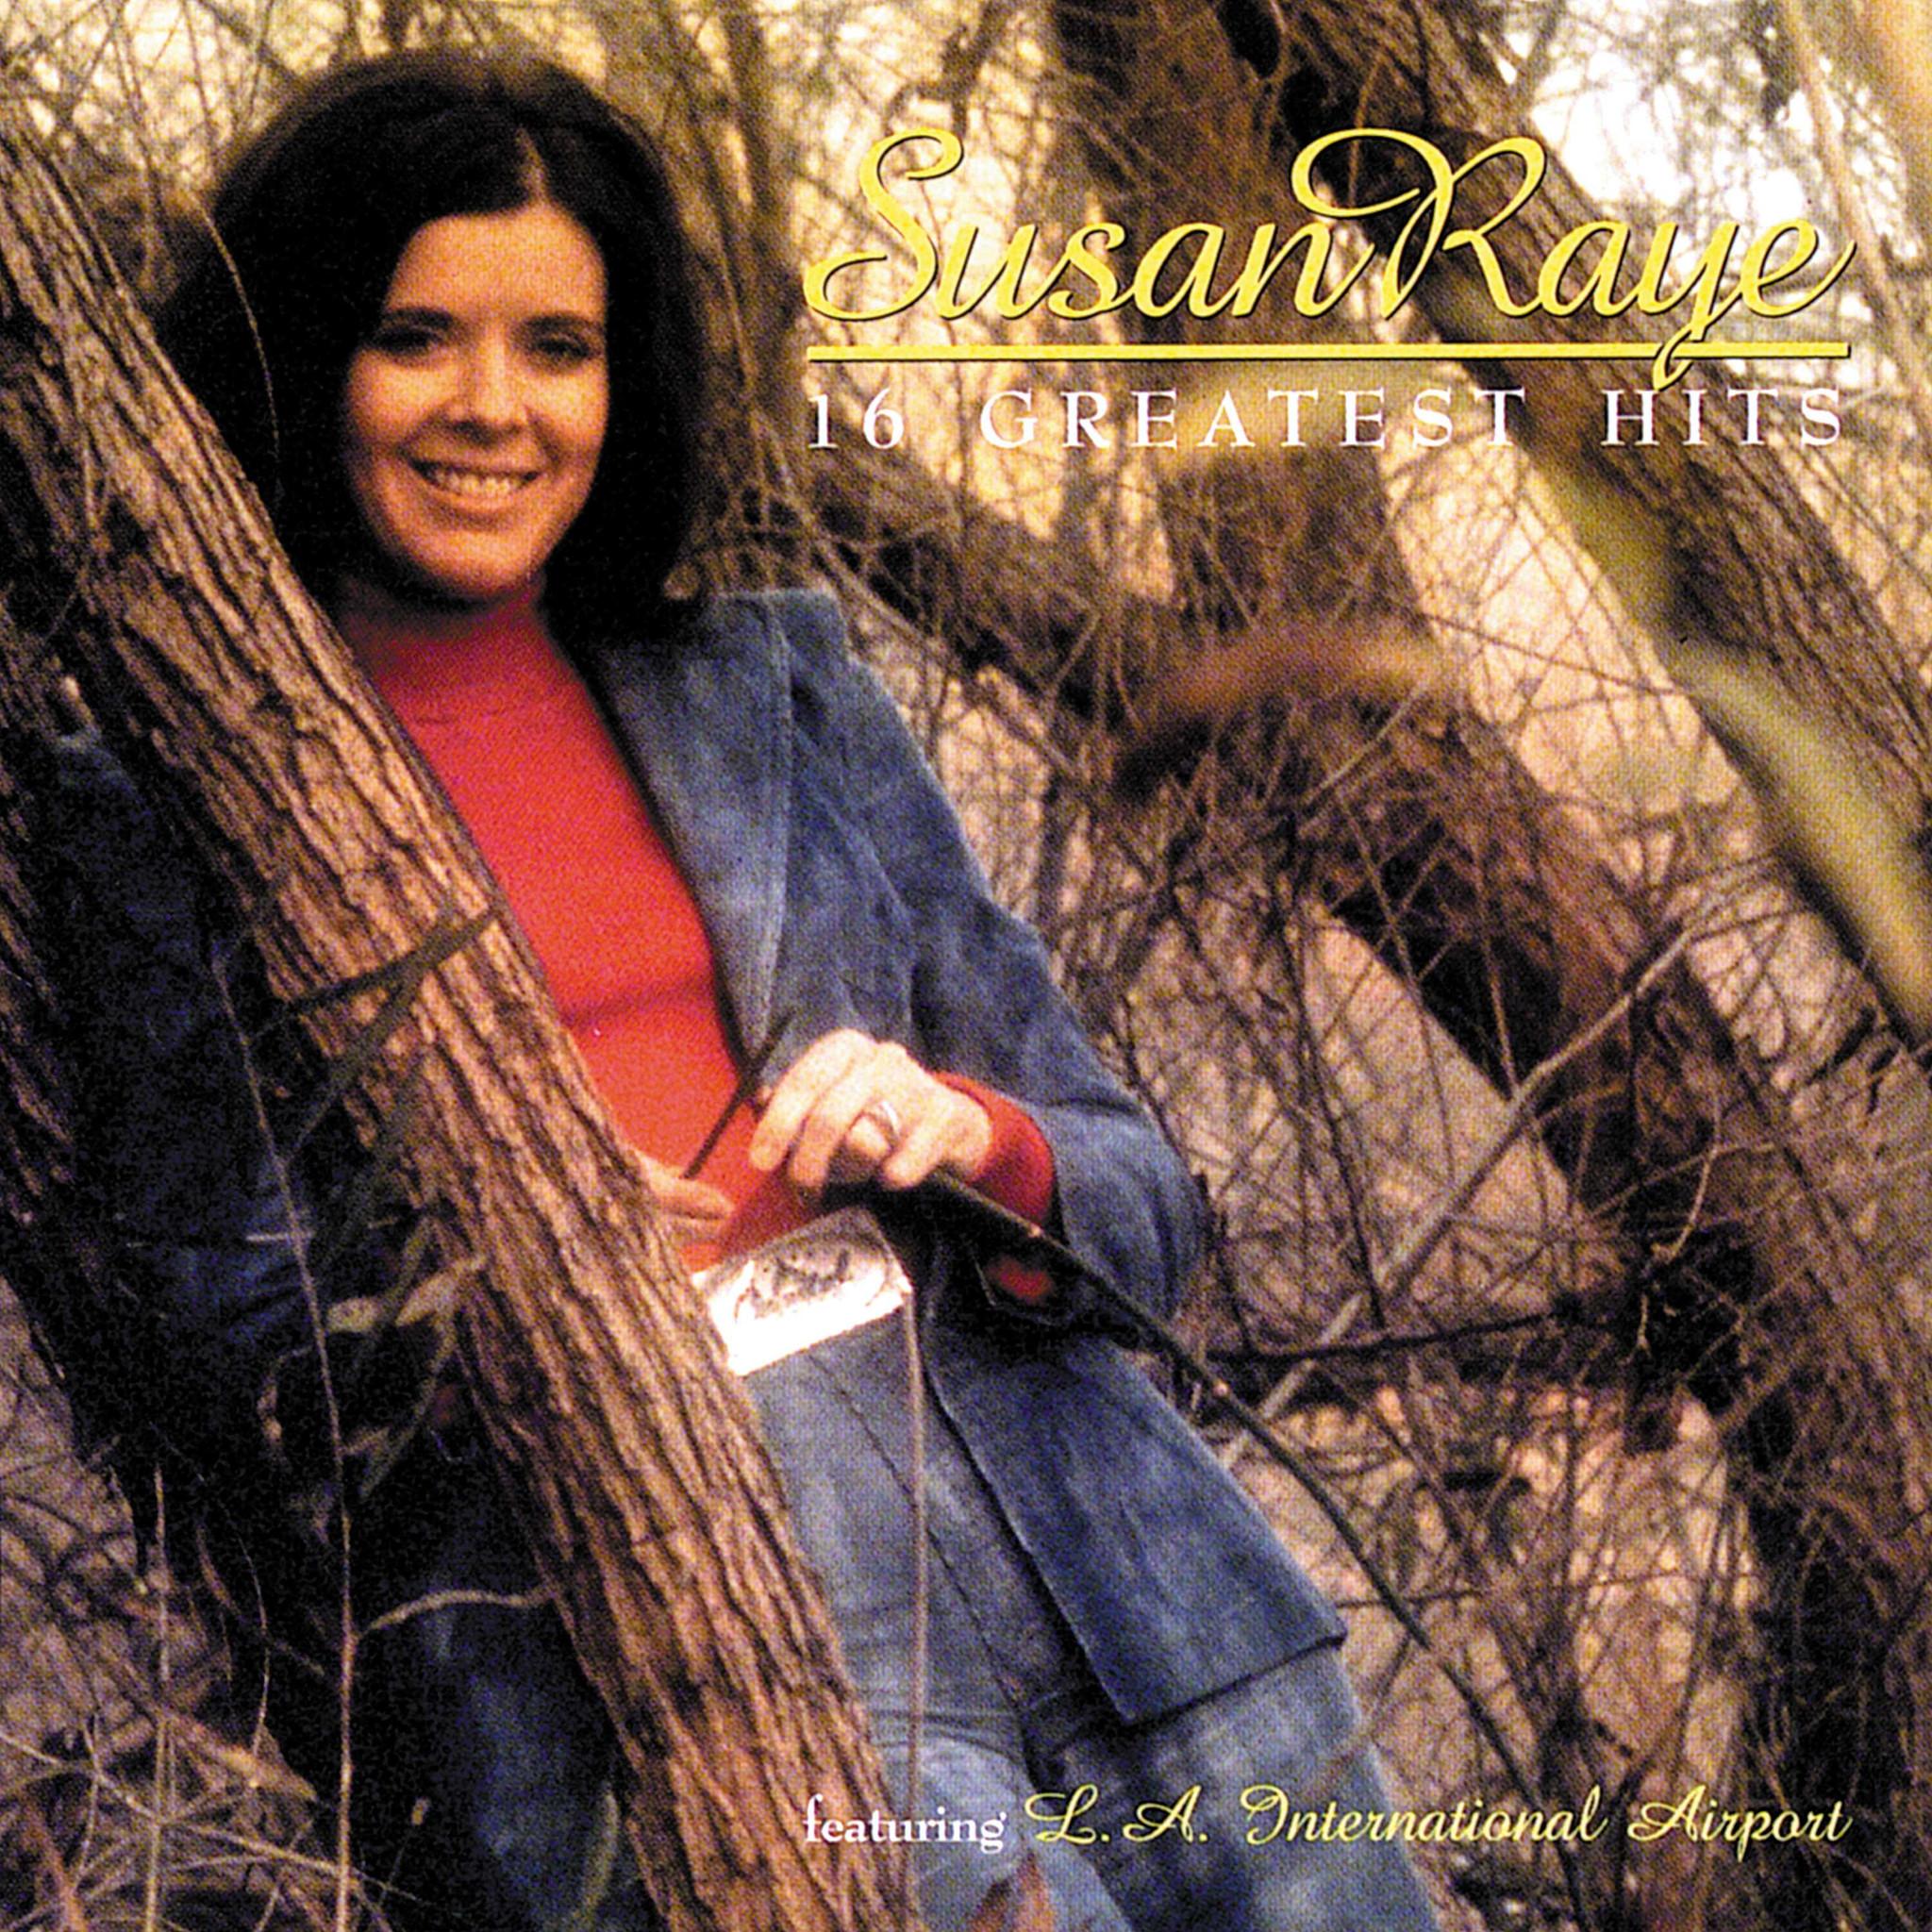 16 Greatest Hits - Susan Raye - Musik - VARESE SARABANDE - 0030206602821 - September 14, 1999